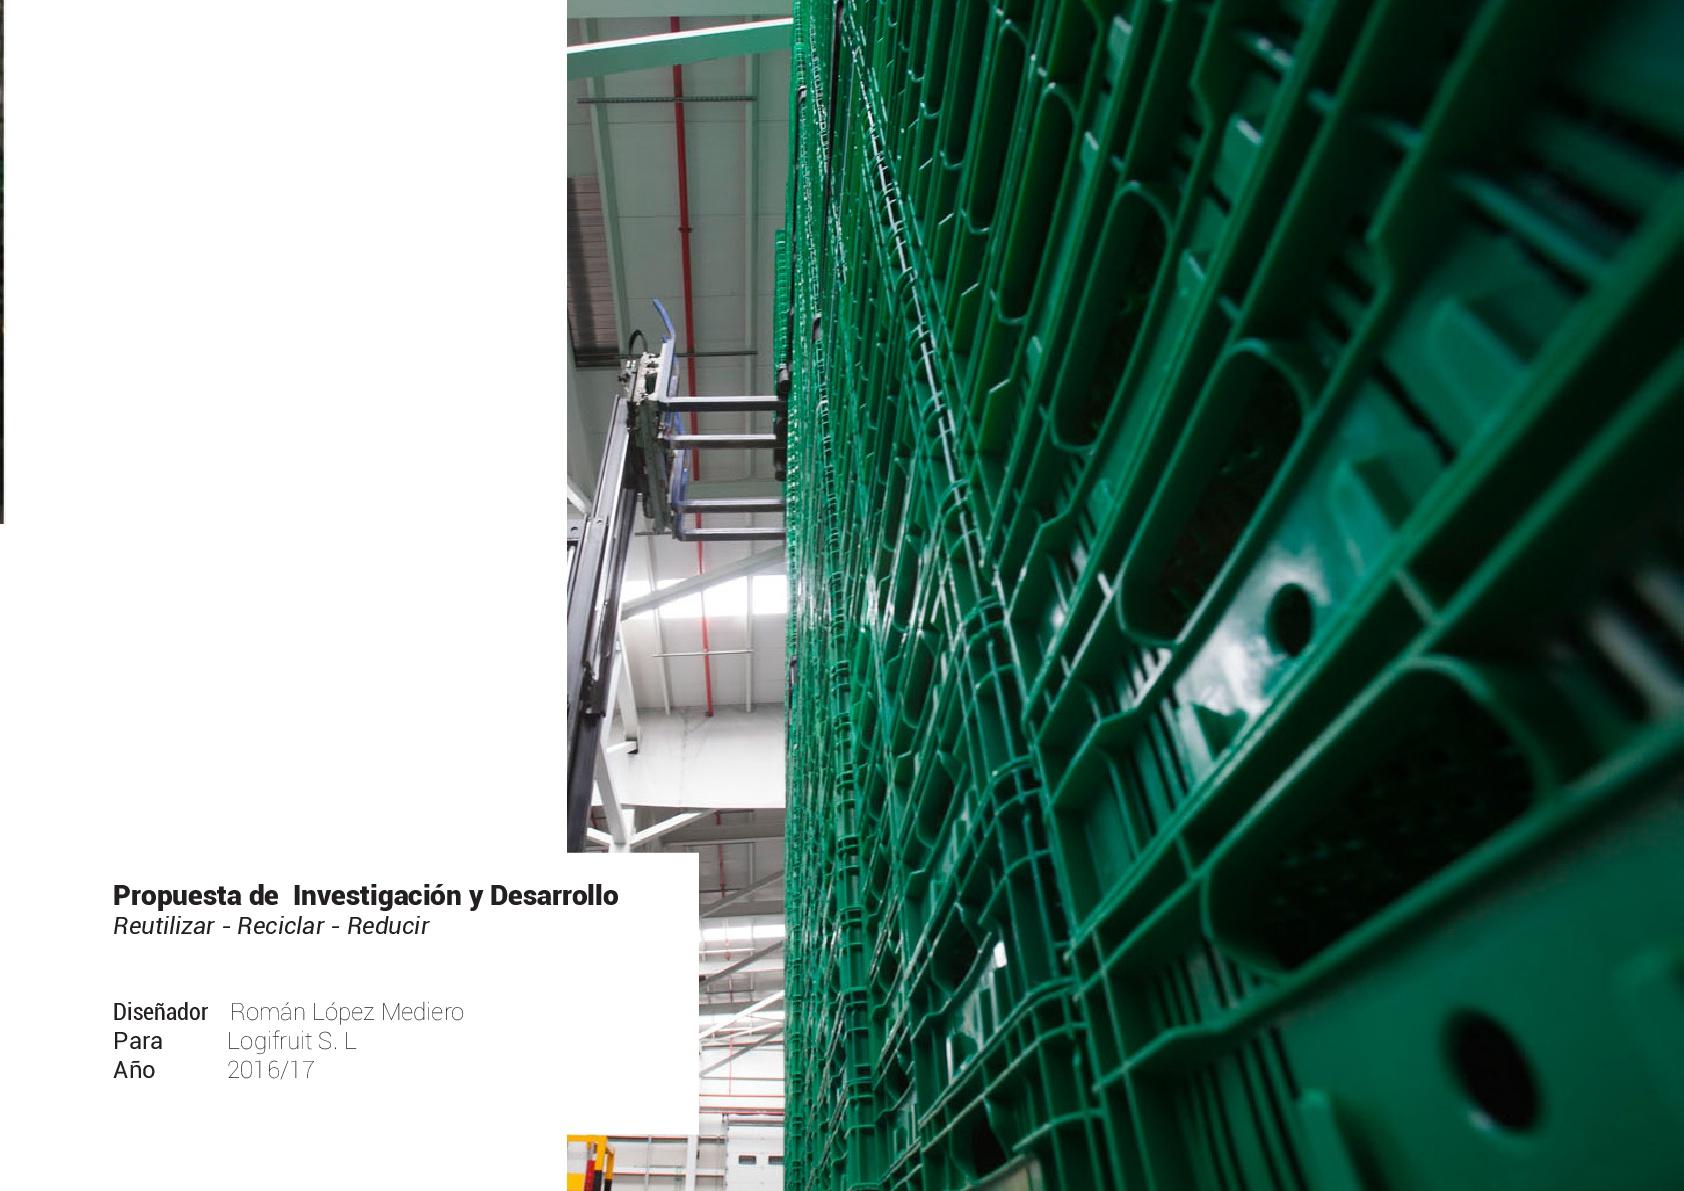 PROPUESTA-LOGIFRUIT-053